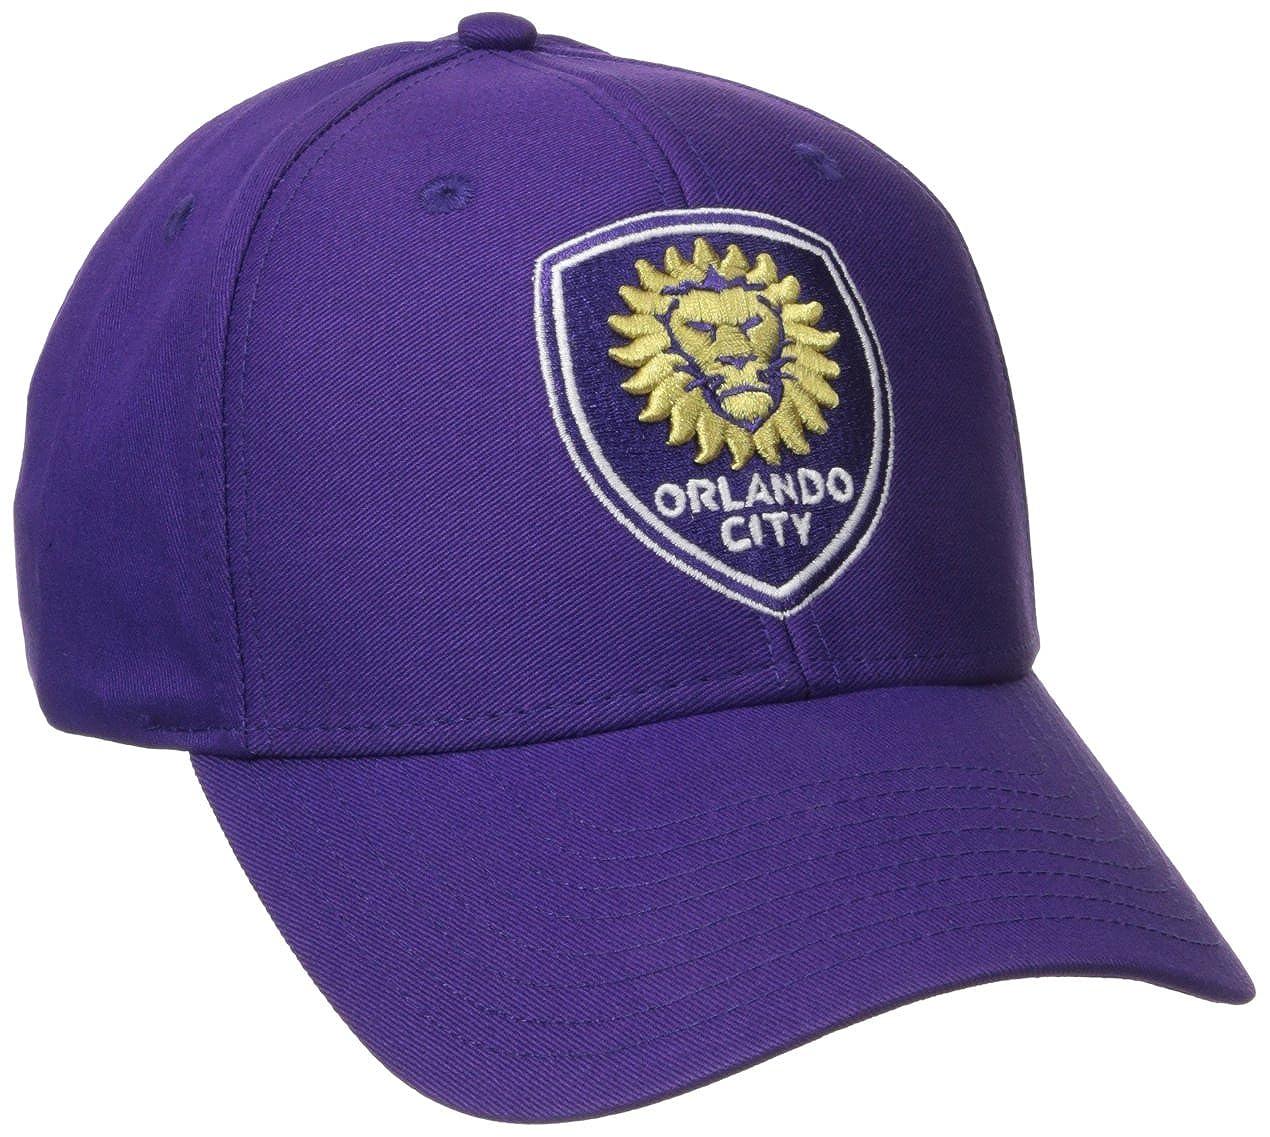 MLS Mens Basic Structured Adjustable Cap